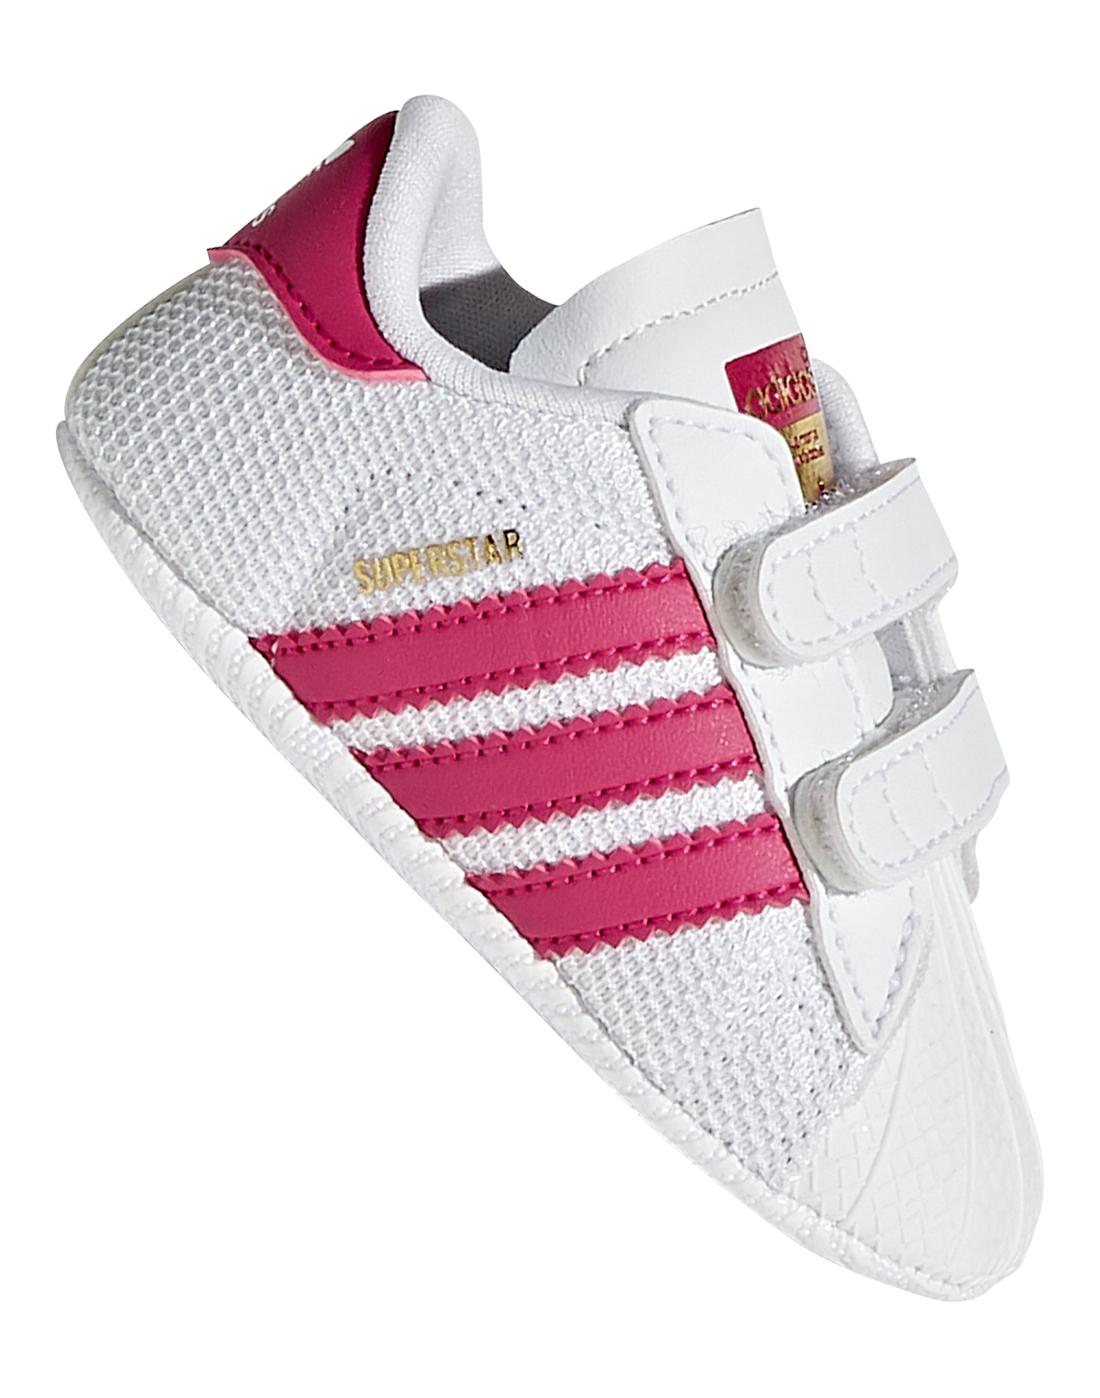 f27b09b384d76 adidas Originals. Infant Superstar Crib. Infant Superstar Crib ...